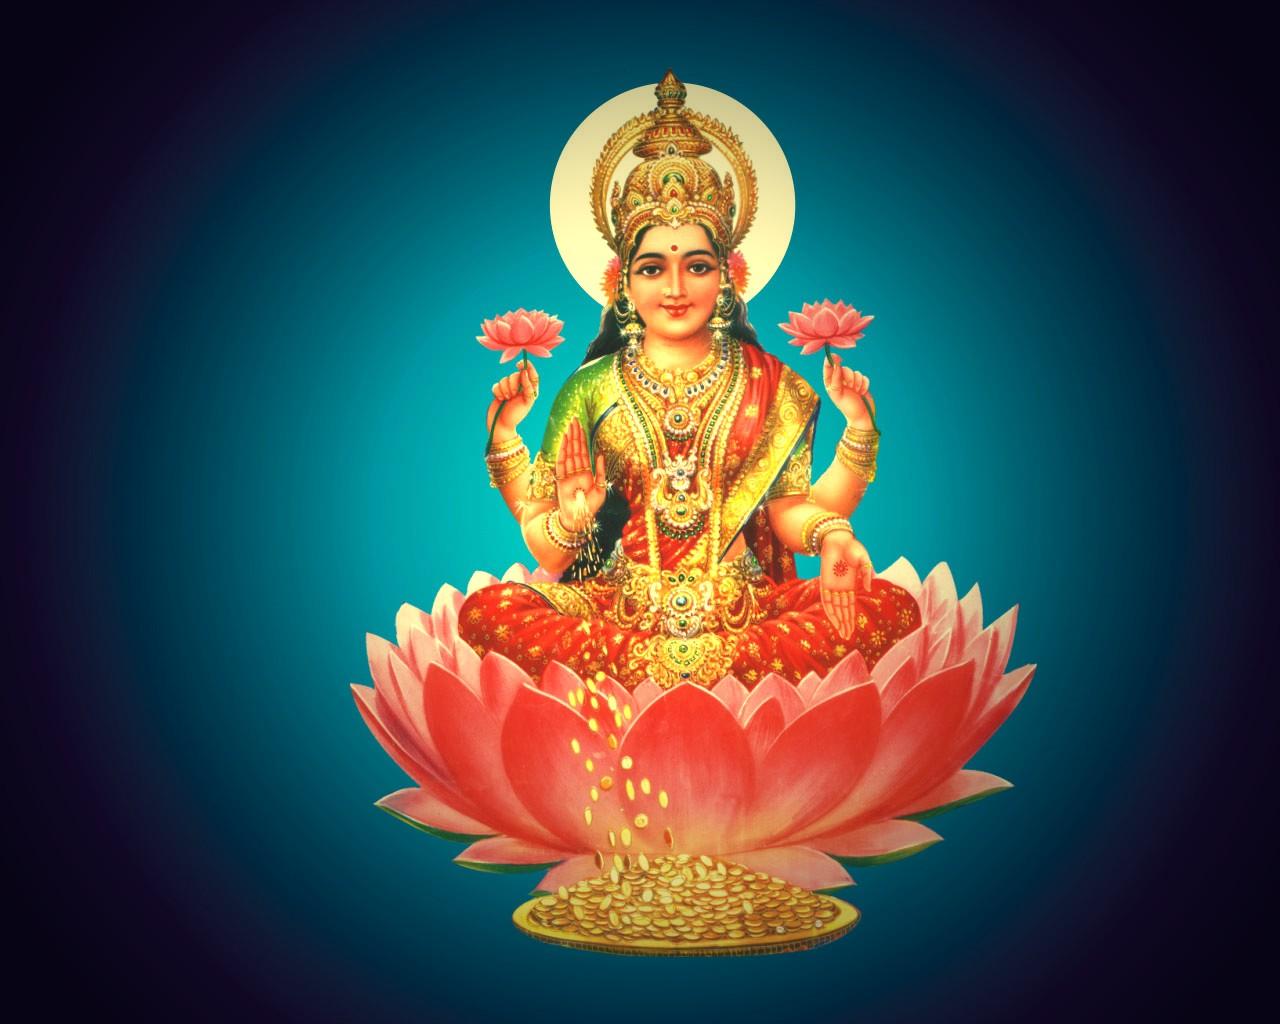 hindu god lakshmi hindu god lakshmi on pink lotus 1280x1024